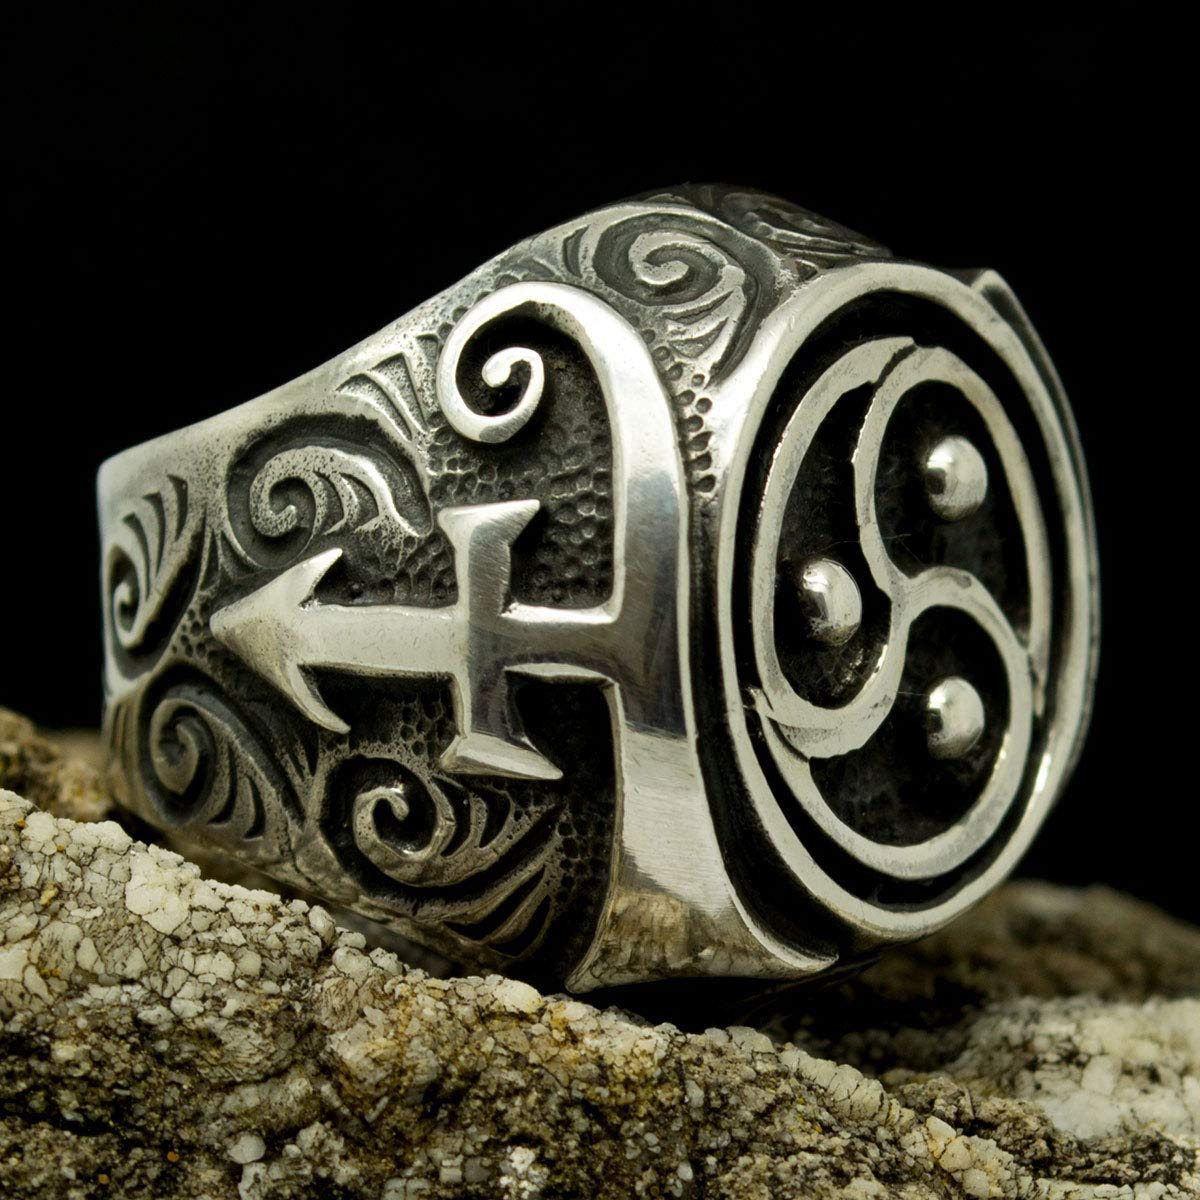 Bdsm triskele Bdsm pendant